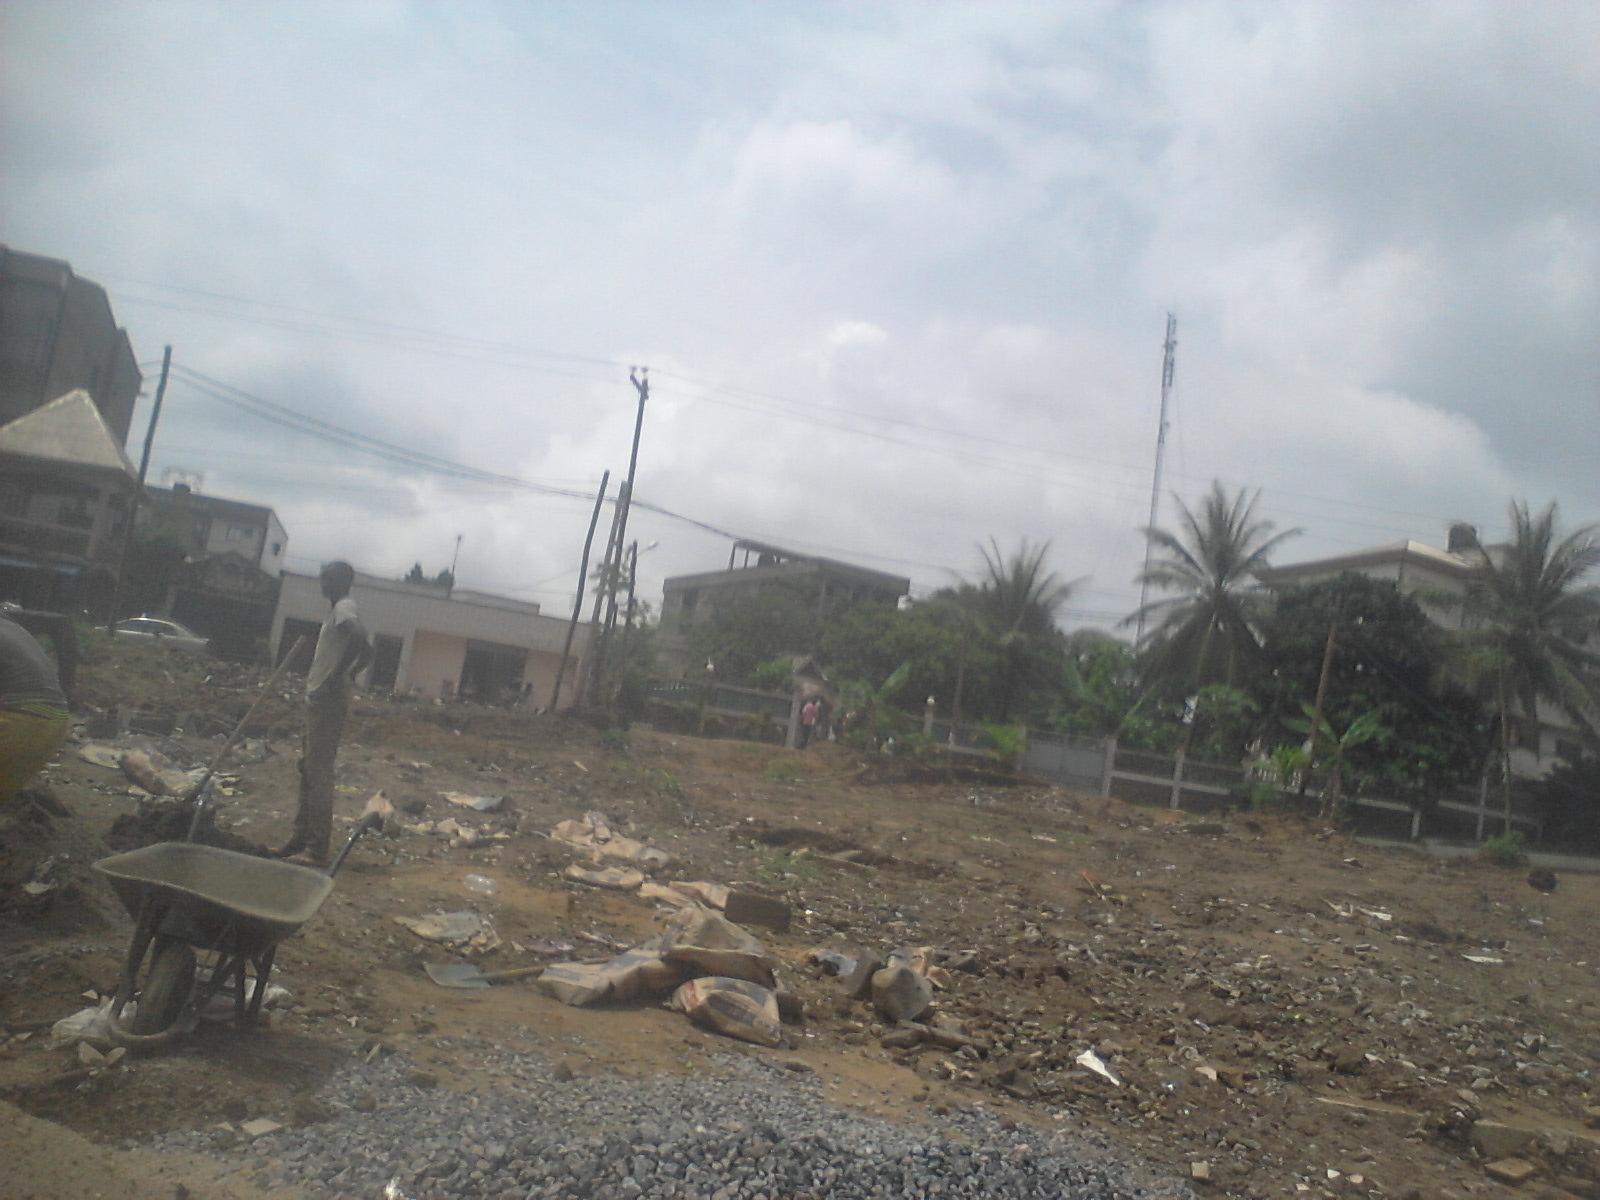 Terrain à vendre - Douala, Logpom, bassong - 200 m2 - 11 000 000 FCFA